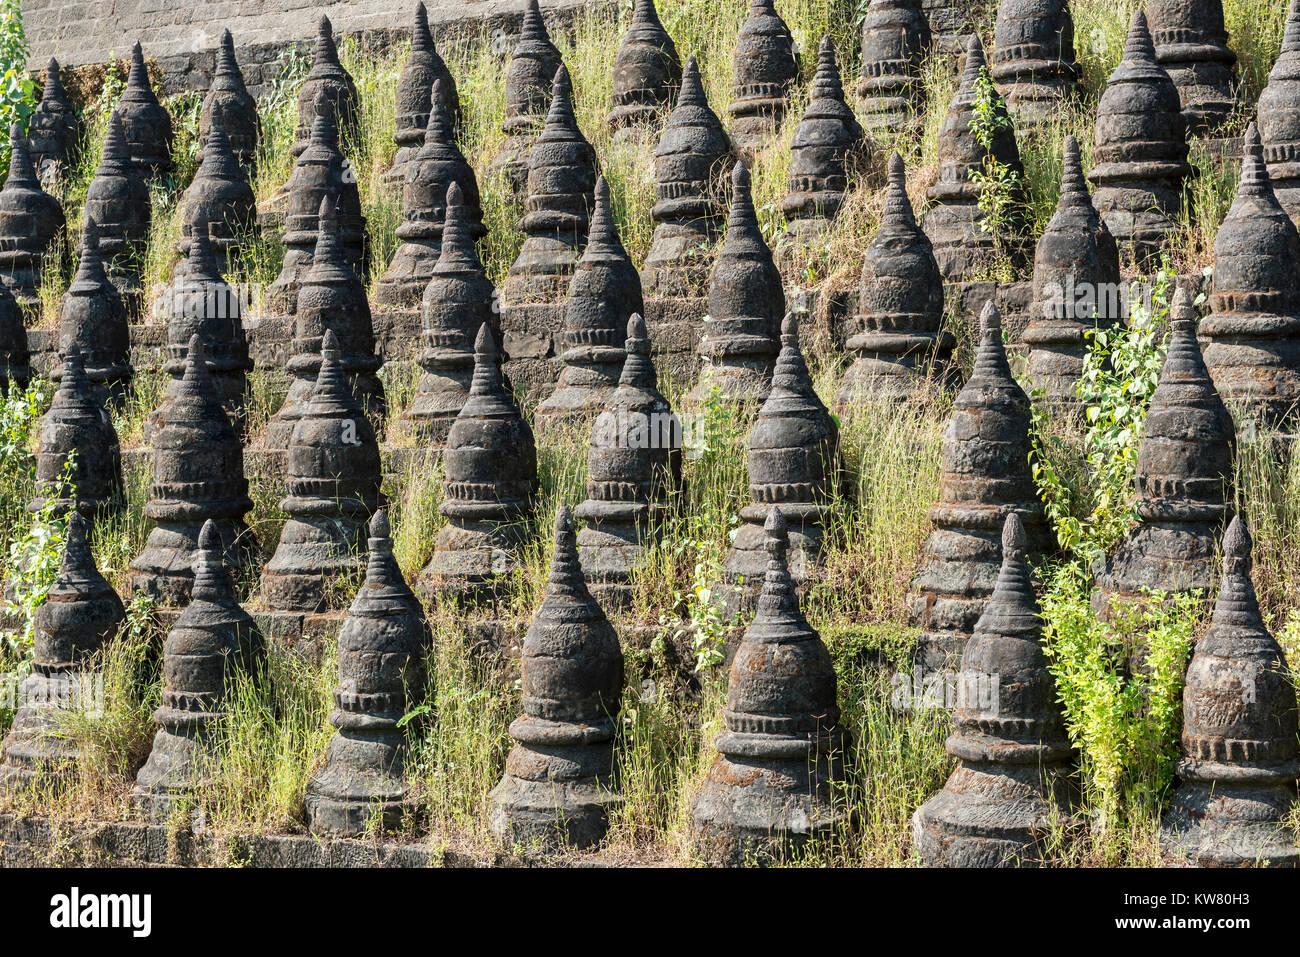 Koe Thaung (Kothaung) Pagoda, Mrauk U, Burma (Myanmar) Stock Photo